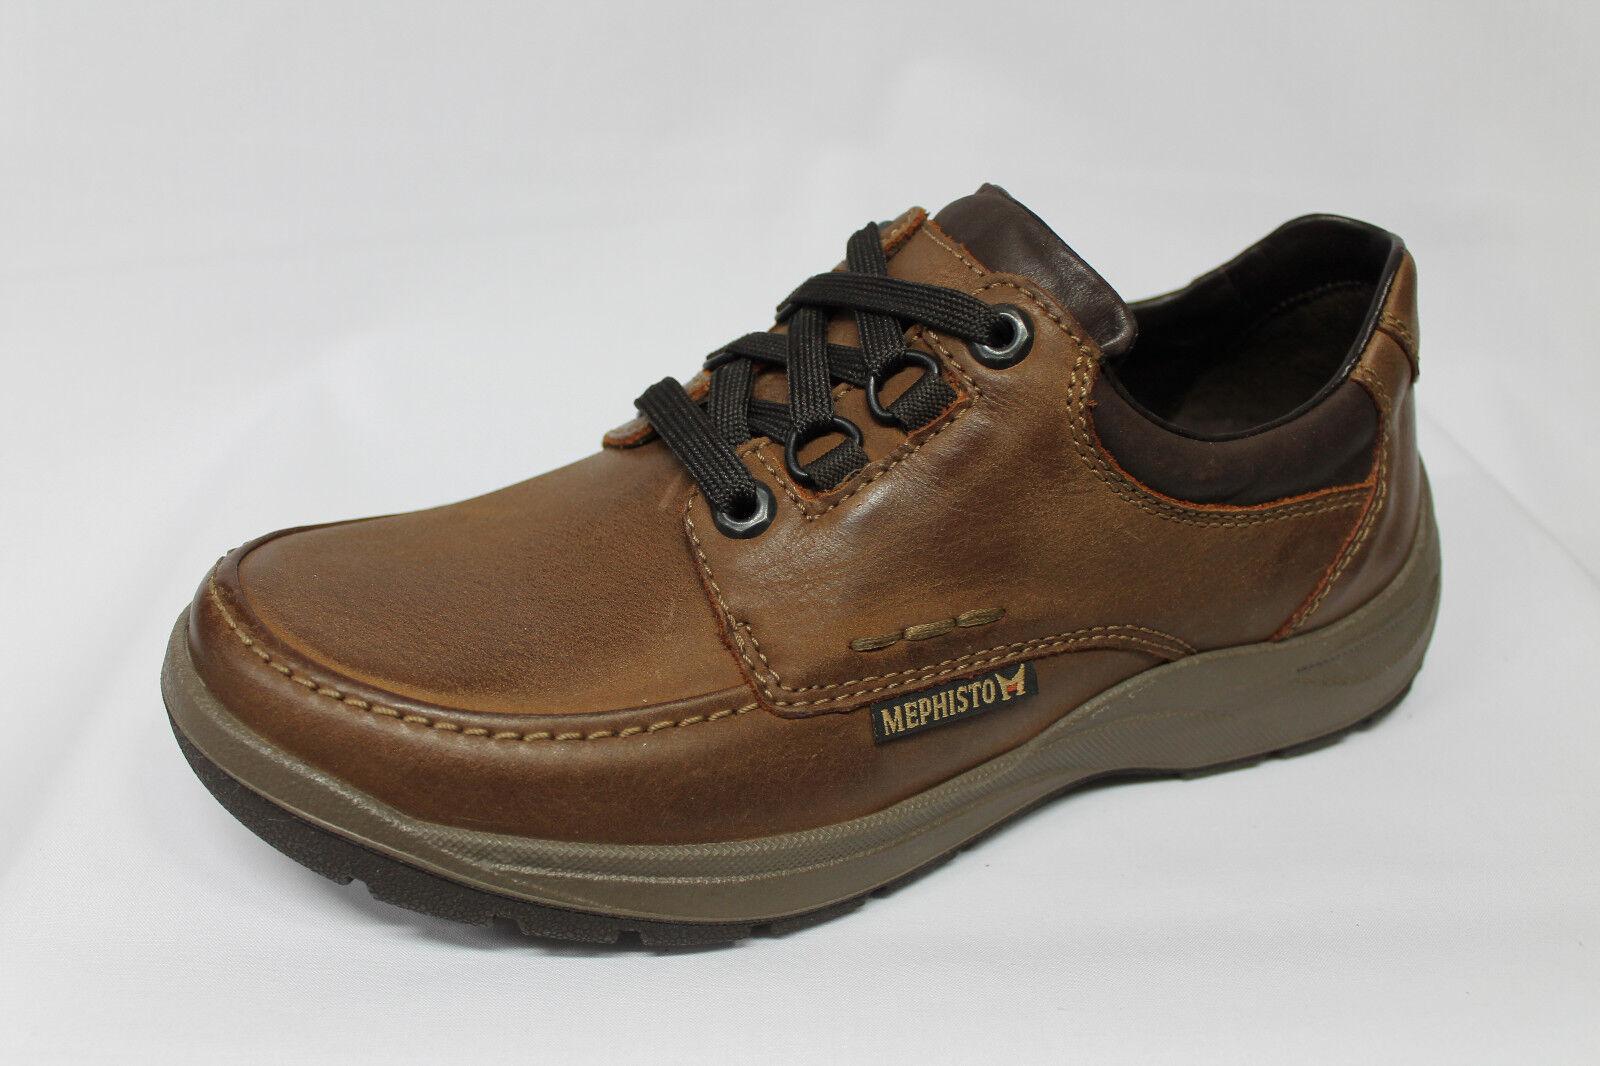 shoes Mephisto Belion pelle ingrassata cuoio listino - 20%